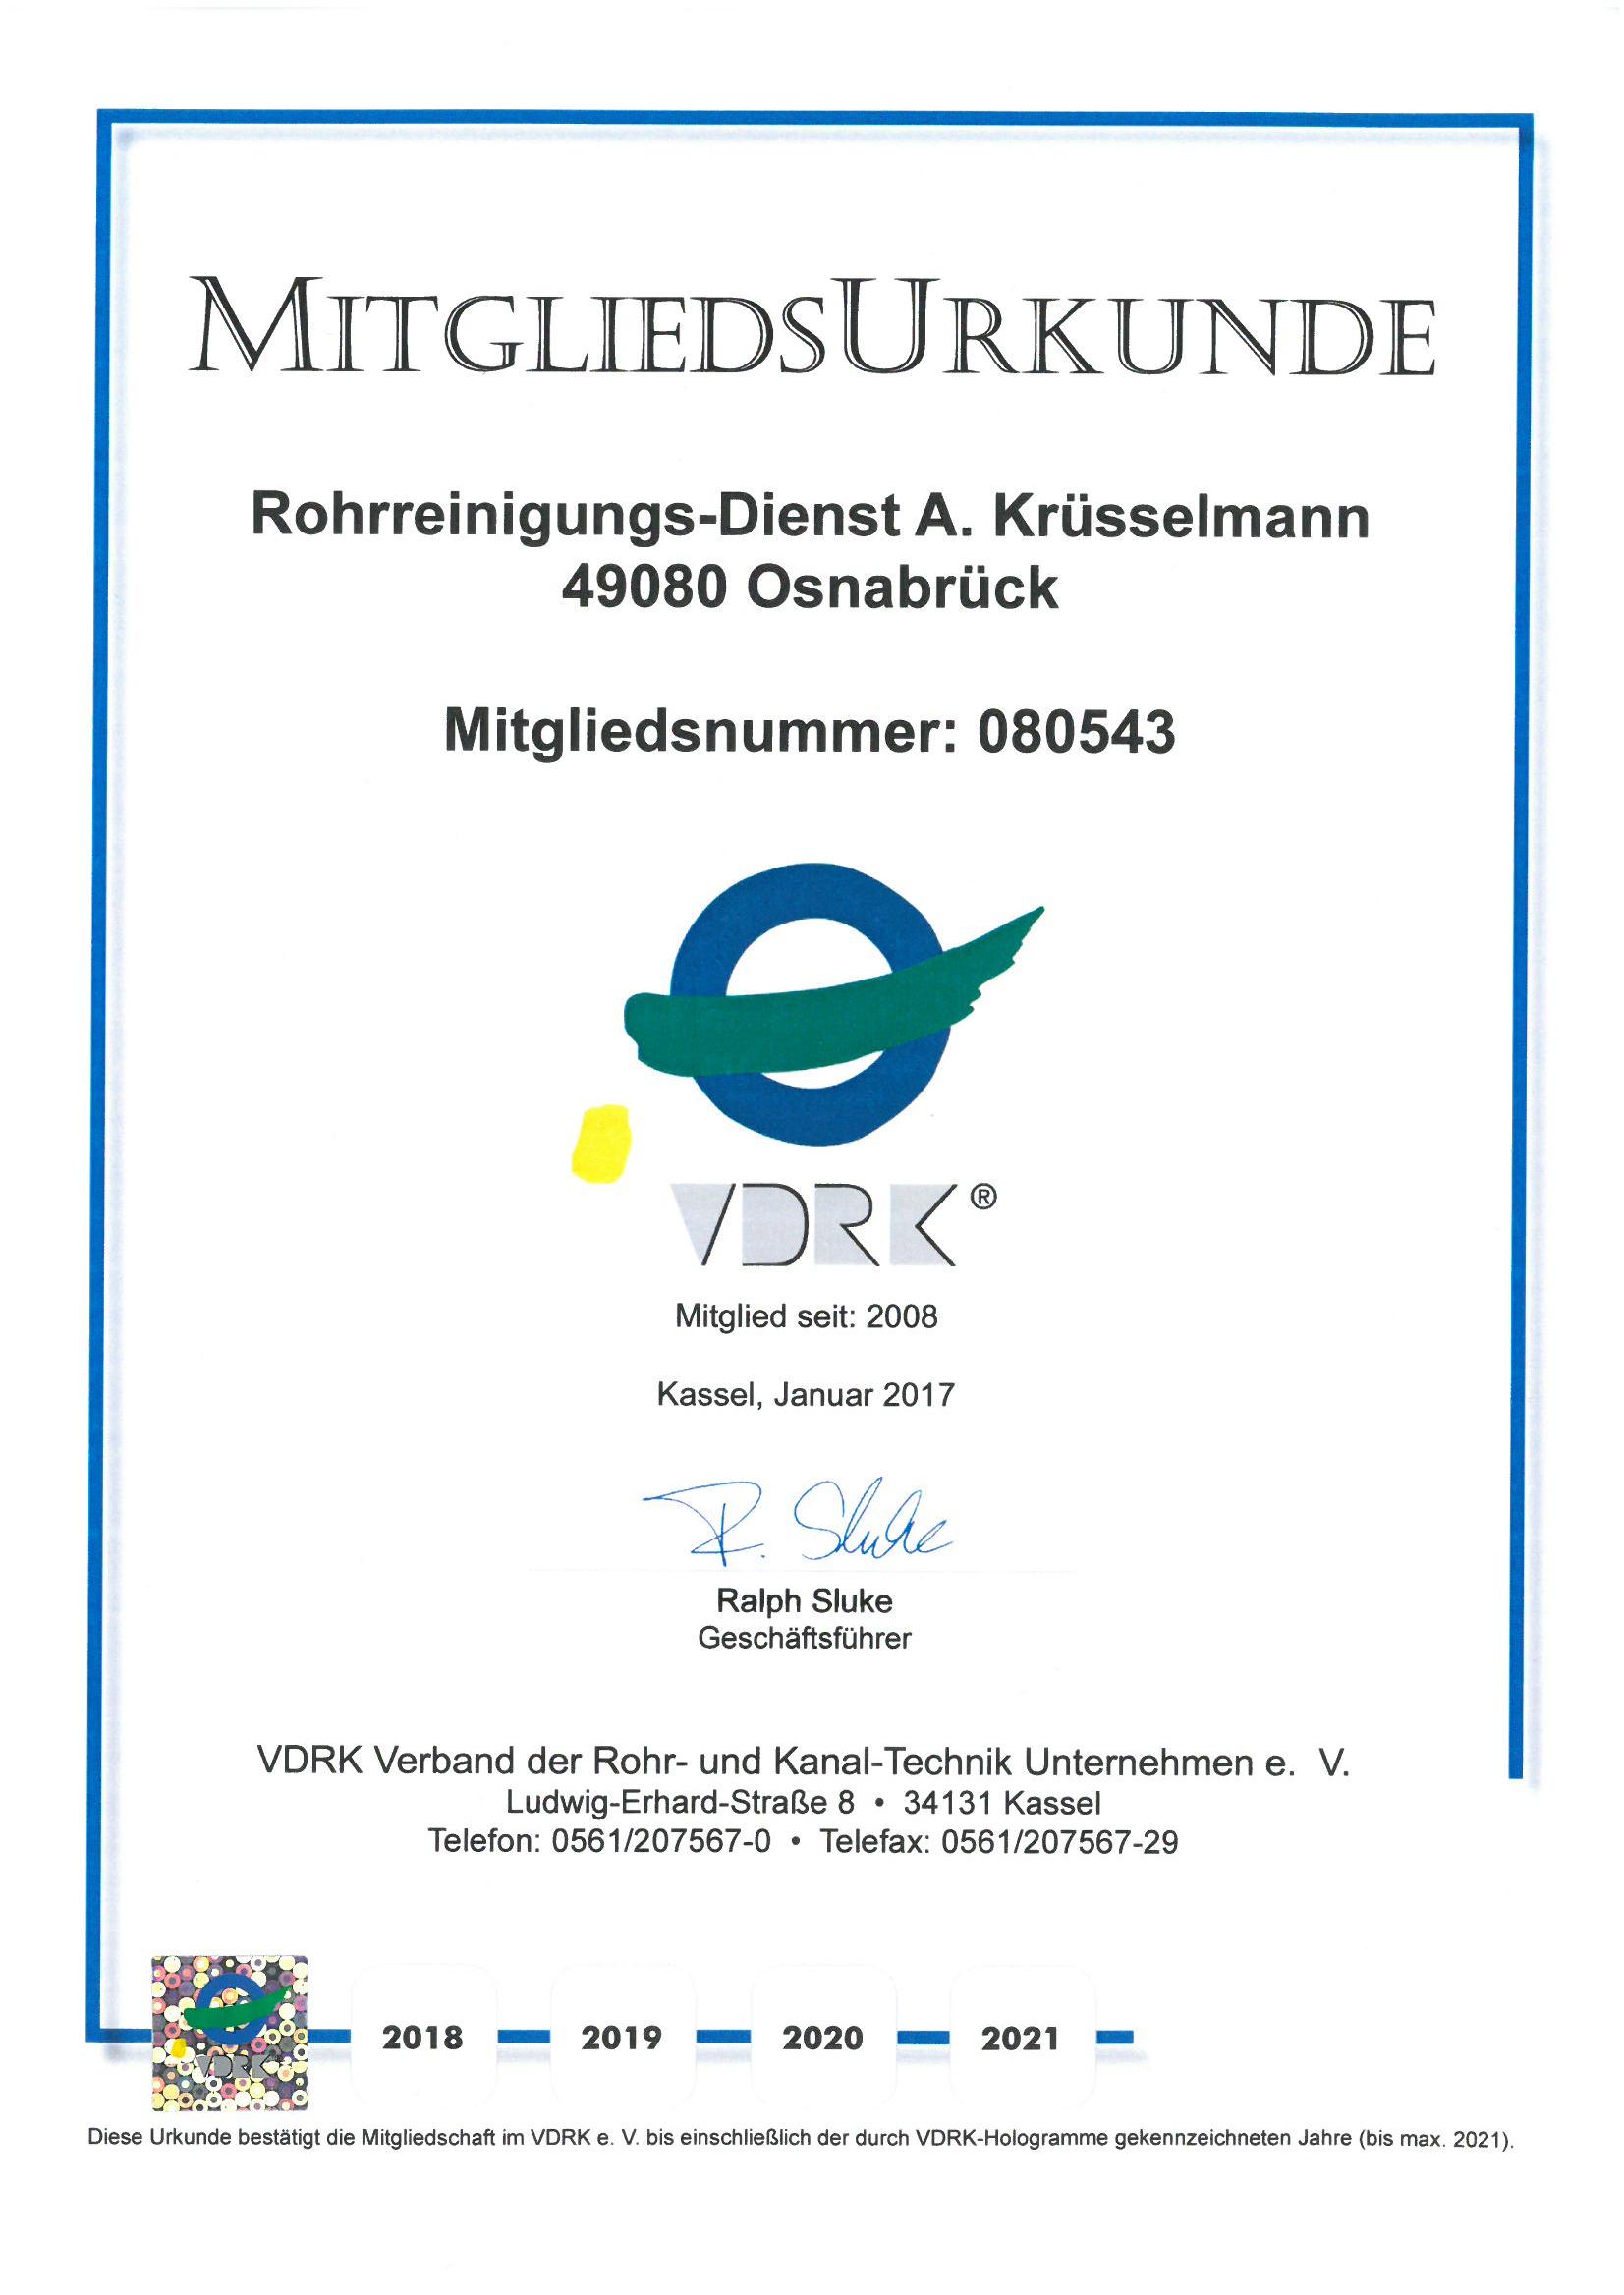 VDRK-Mitglieds-Urkunde